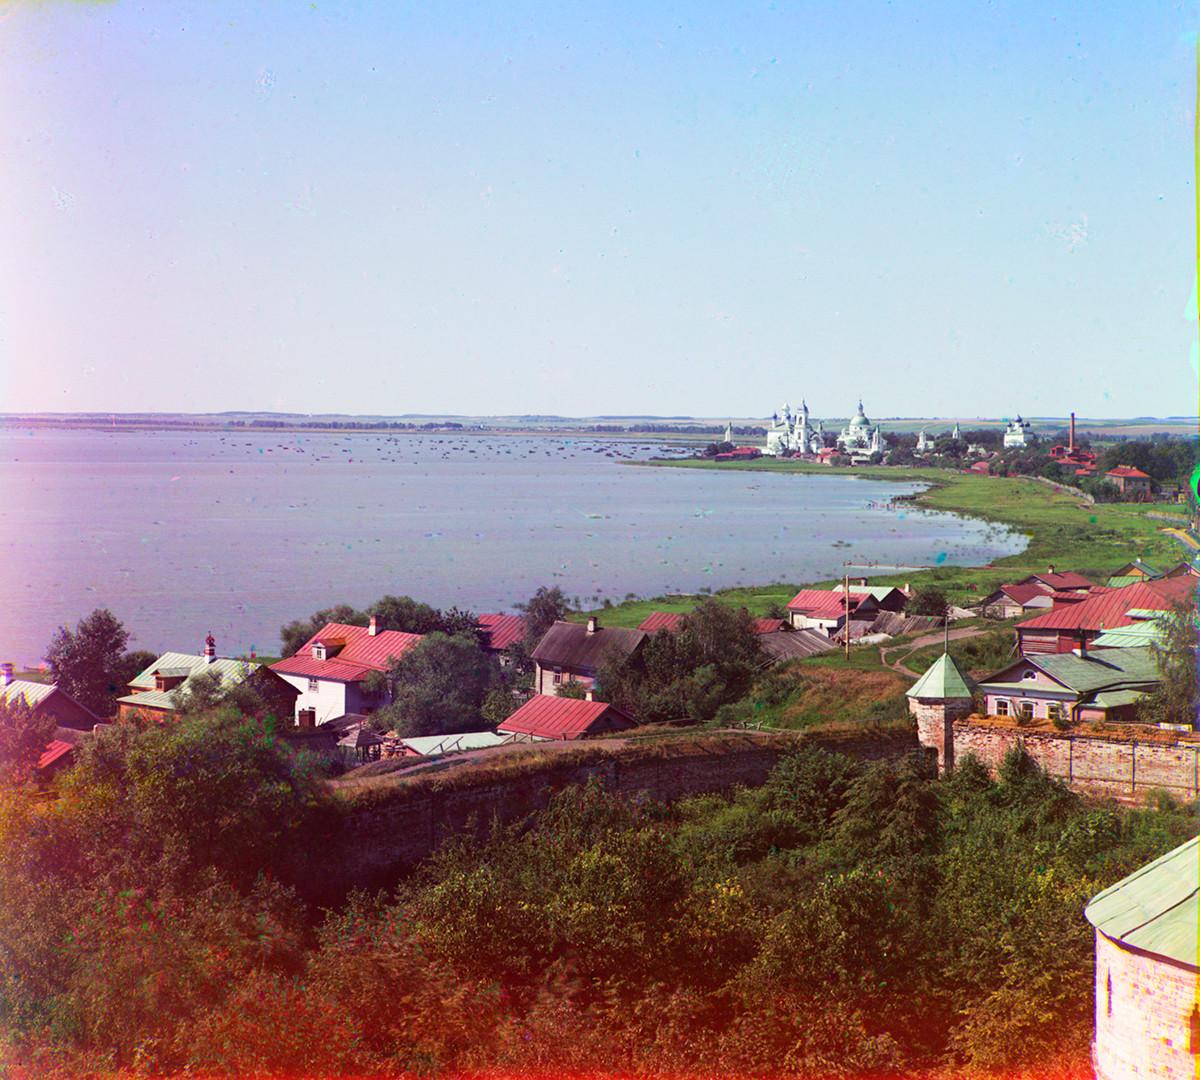 Savior-St. Iakov-St. Dimitry Monastery & north shore of Lake Nero. View west from pinnacle of south tower of Rostov Kremlin. Summer 1911.